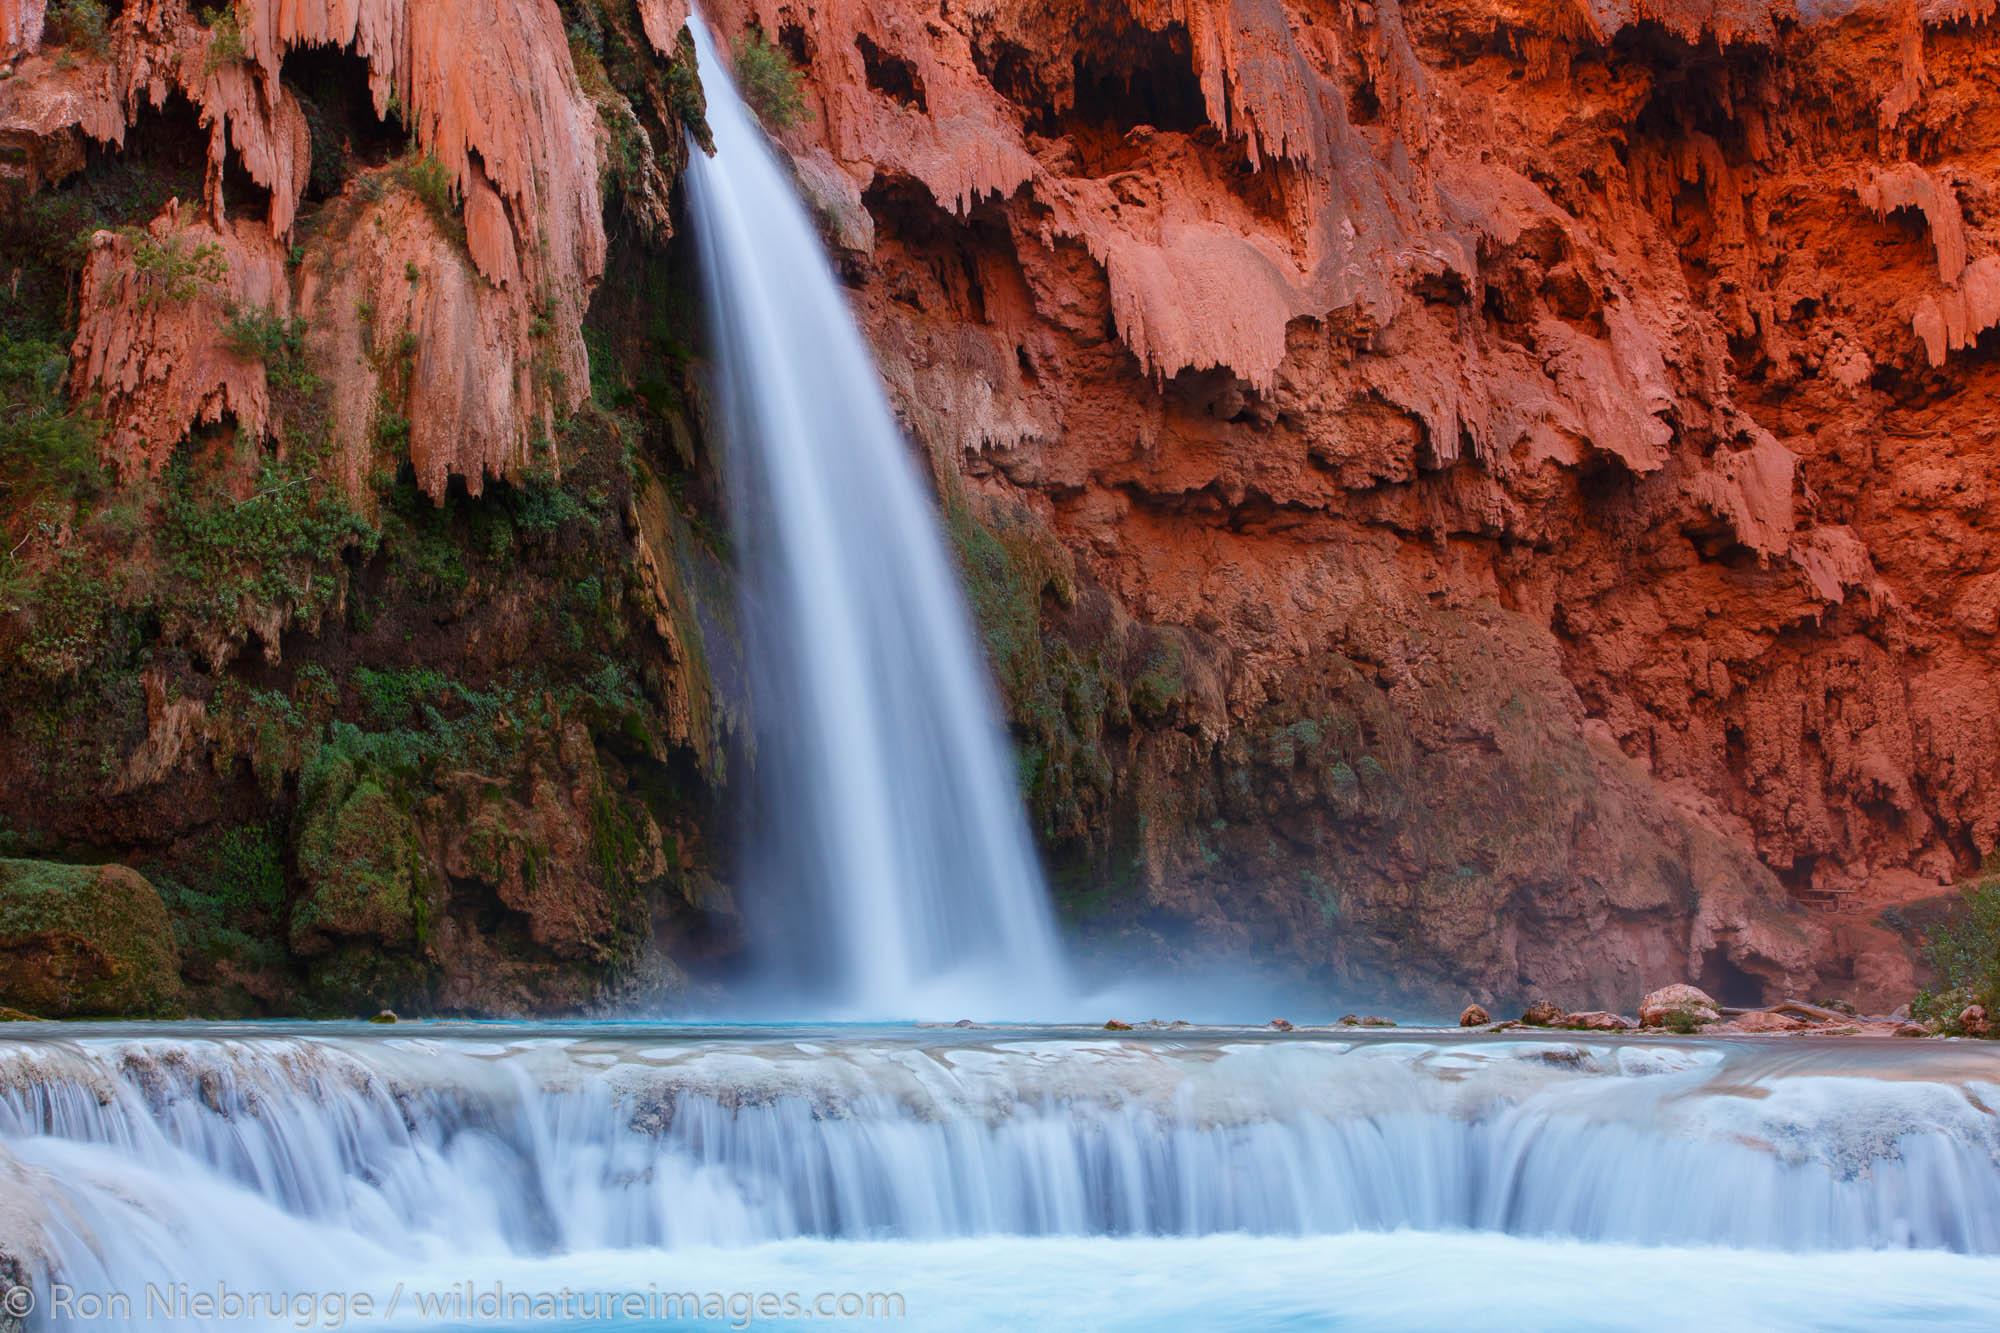 Grand Canyon, Arizona, Havasu Falls, photo